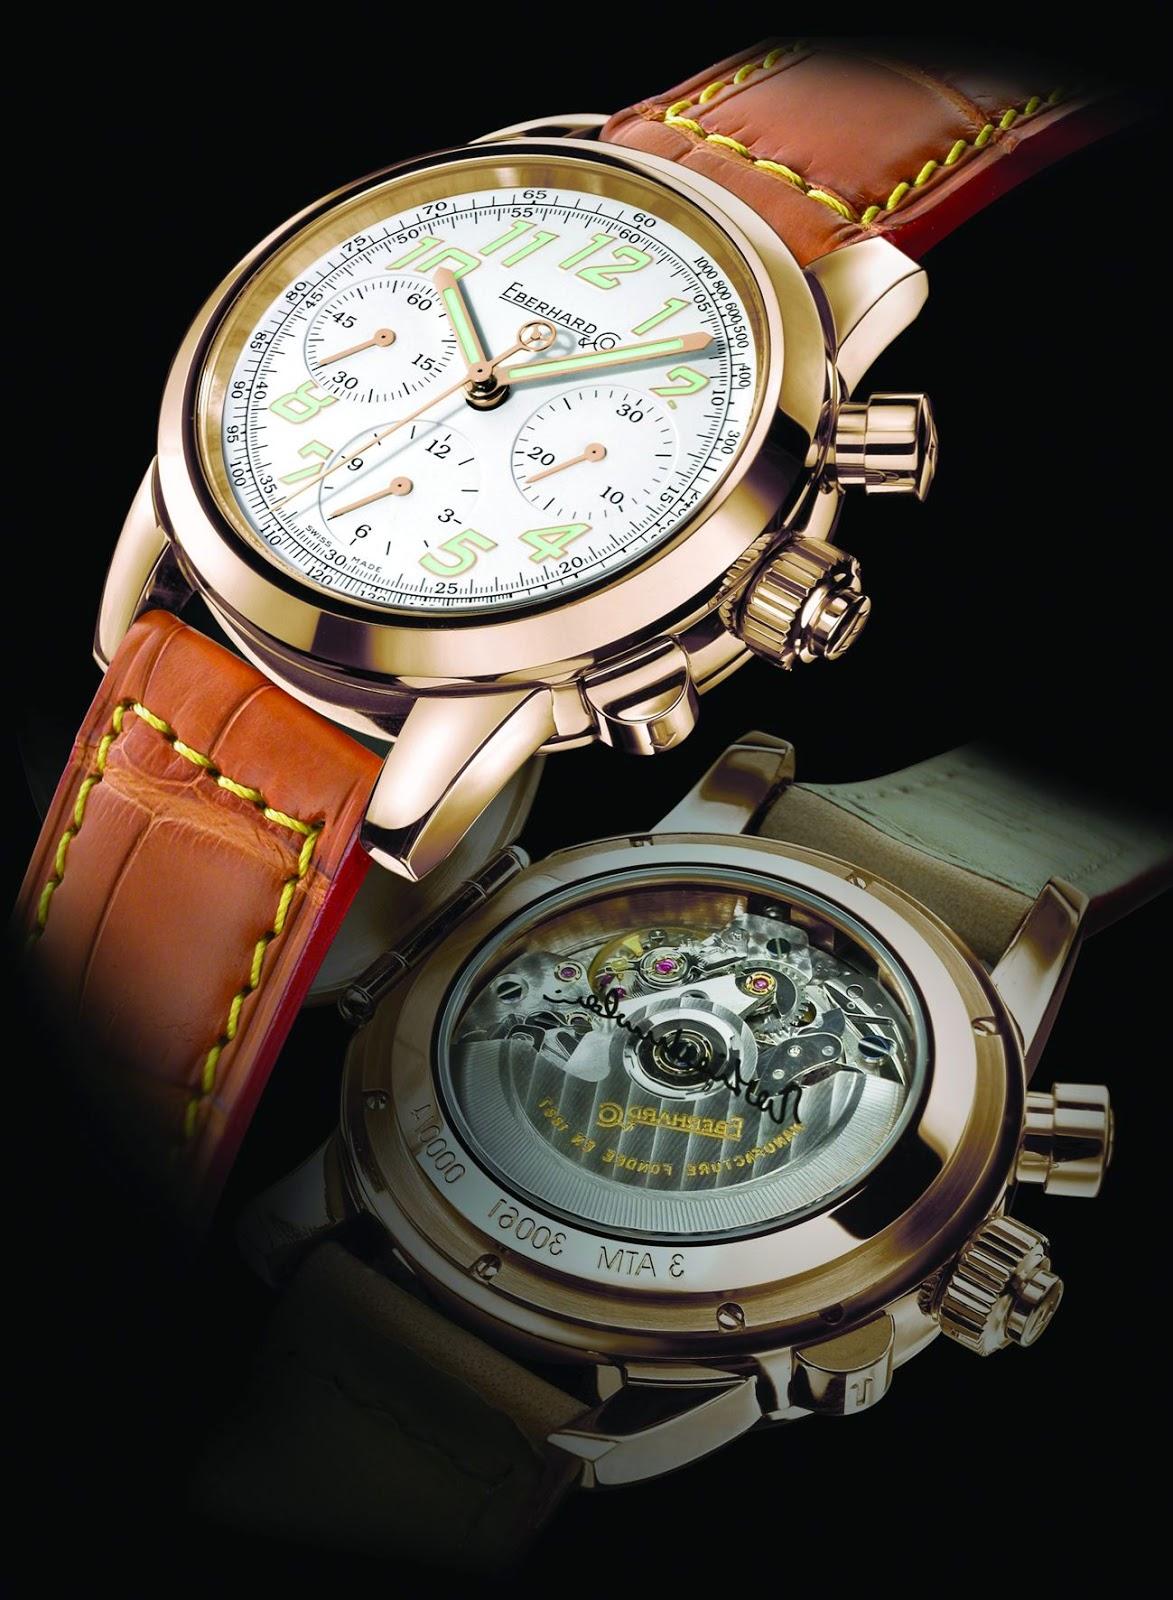 EBERHARD & Co. Vanderbilt Cup automatic chronograph watch